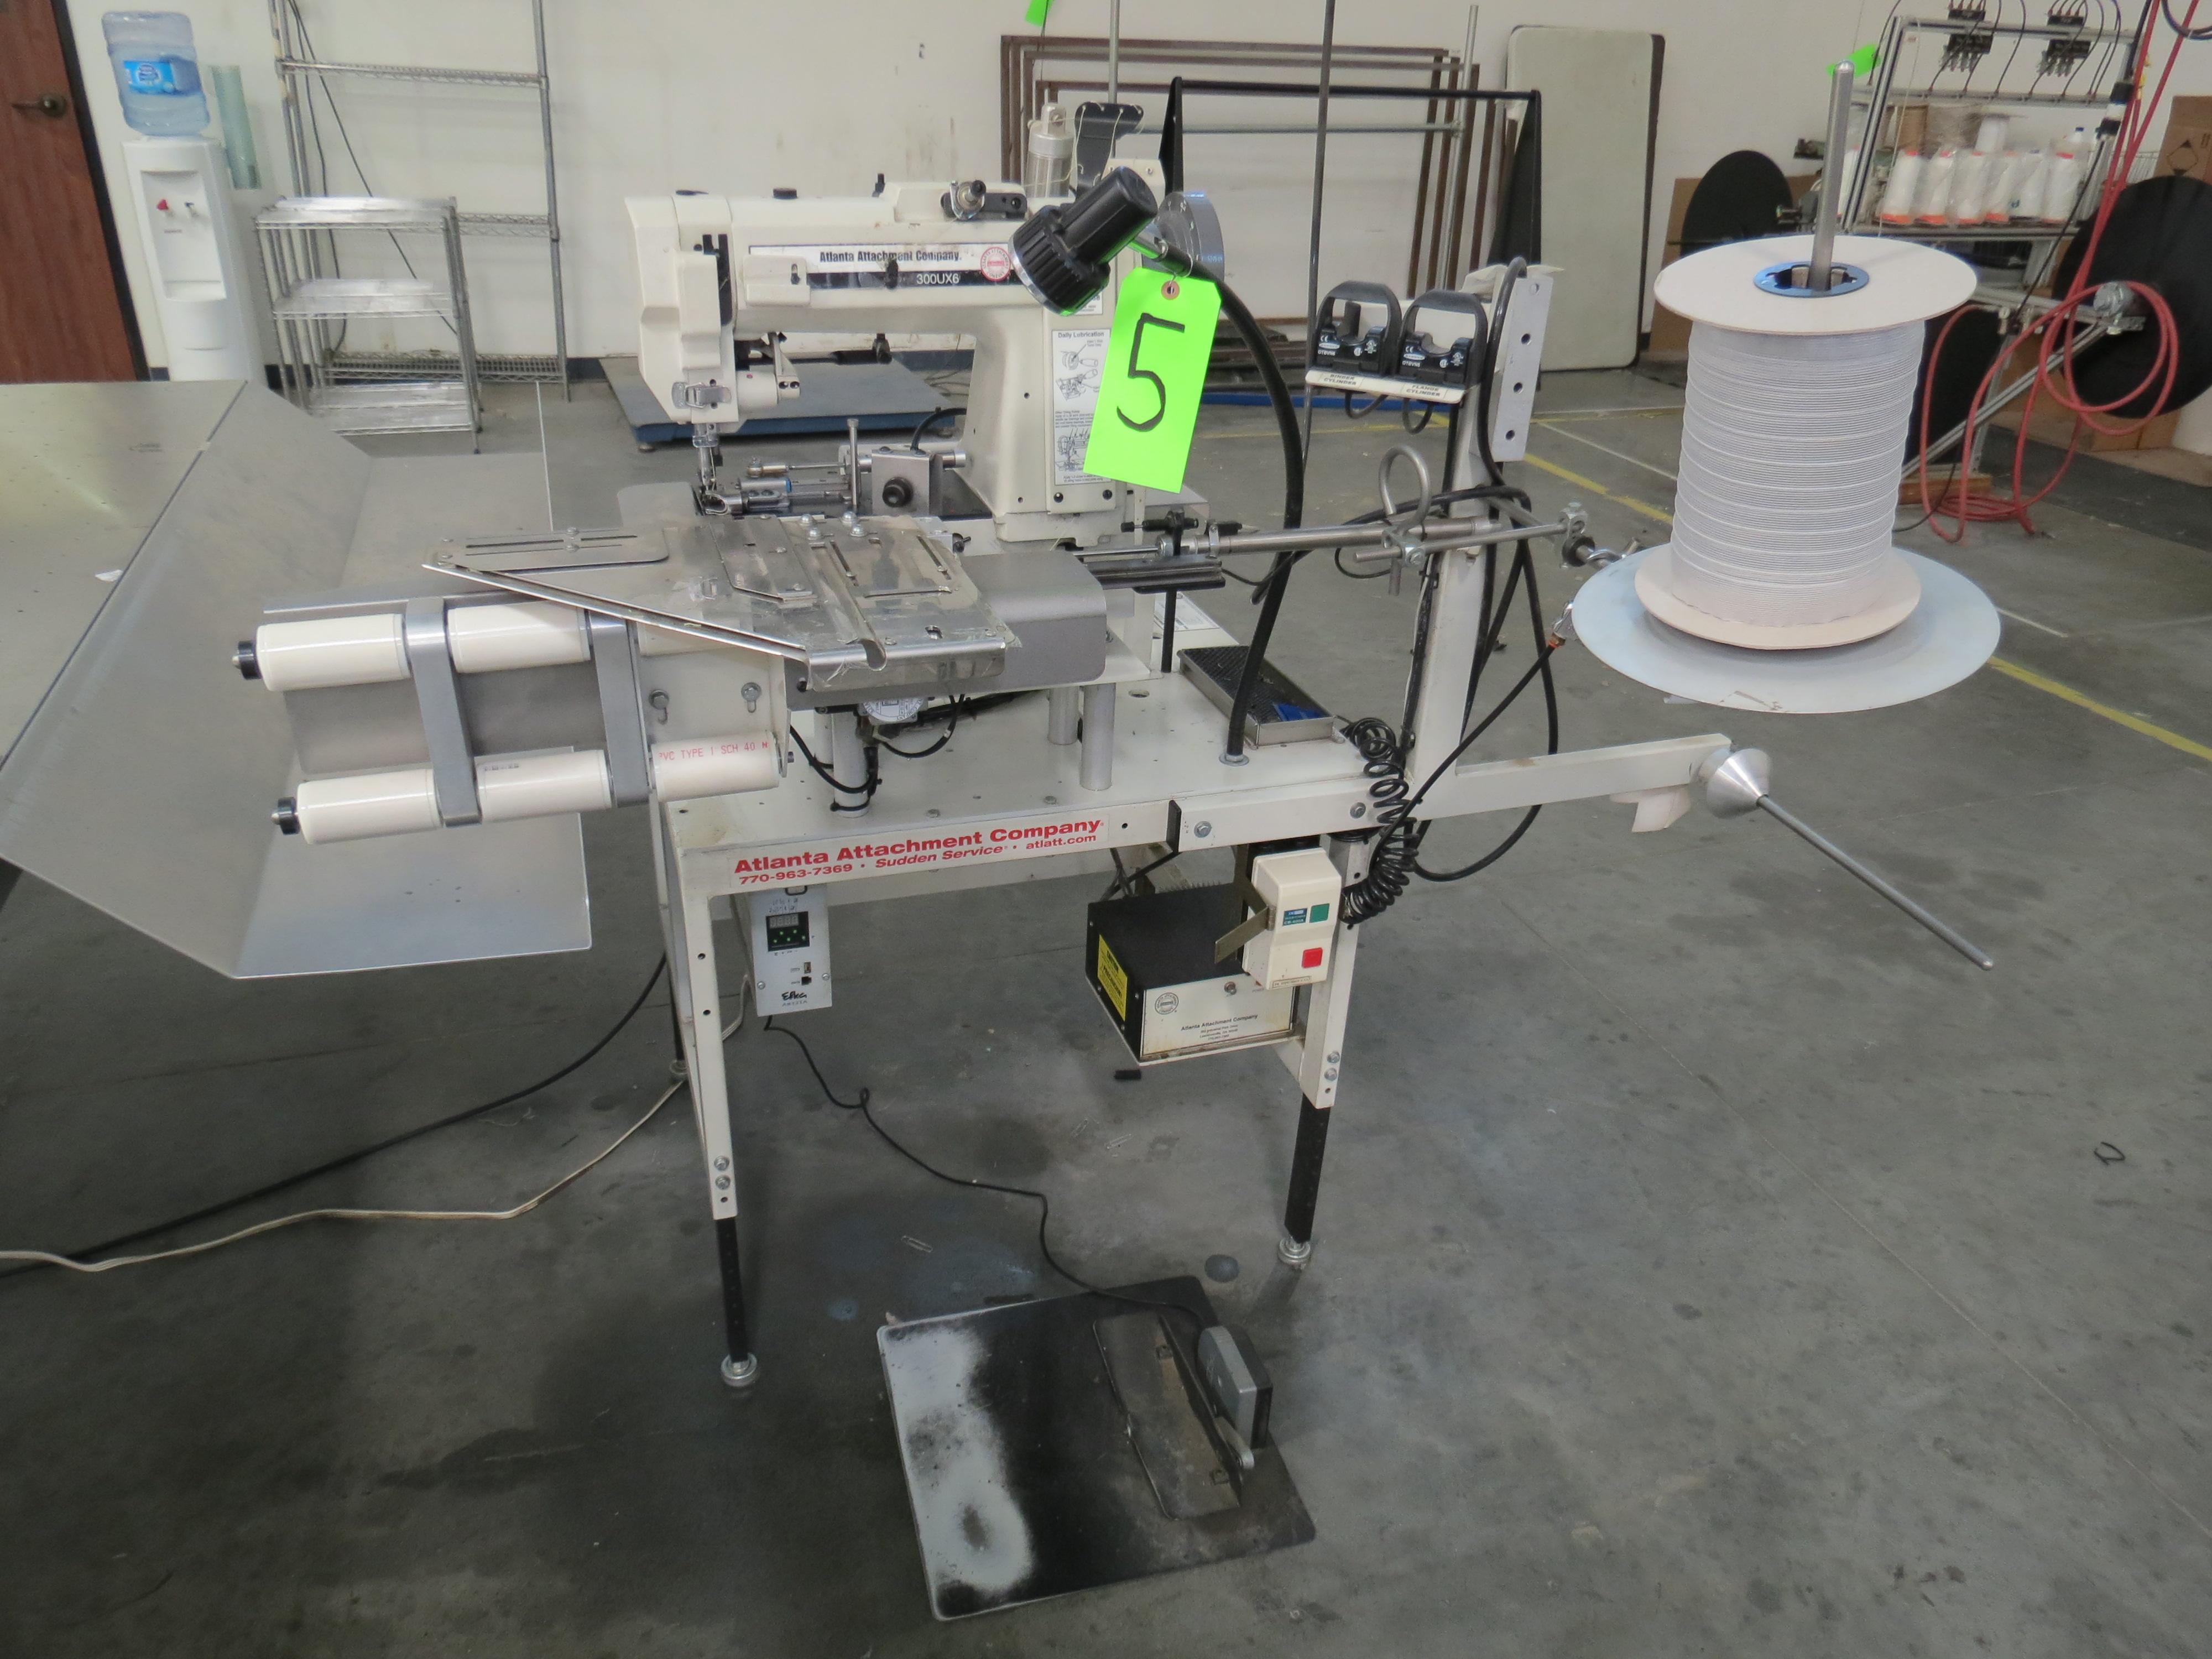 Atlanta Attachment Company 1339HFSHalf-Cap Sewing Machine, SN:209226071617, 220V, AAC 300UX6, (